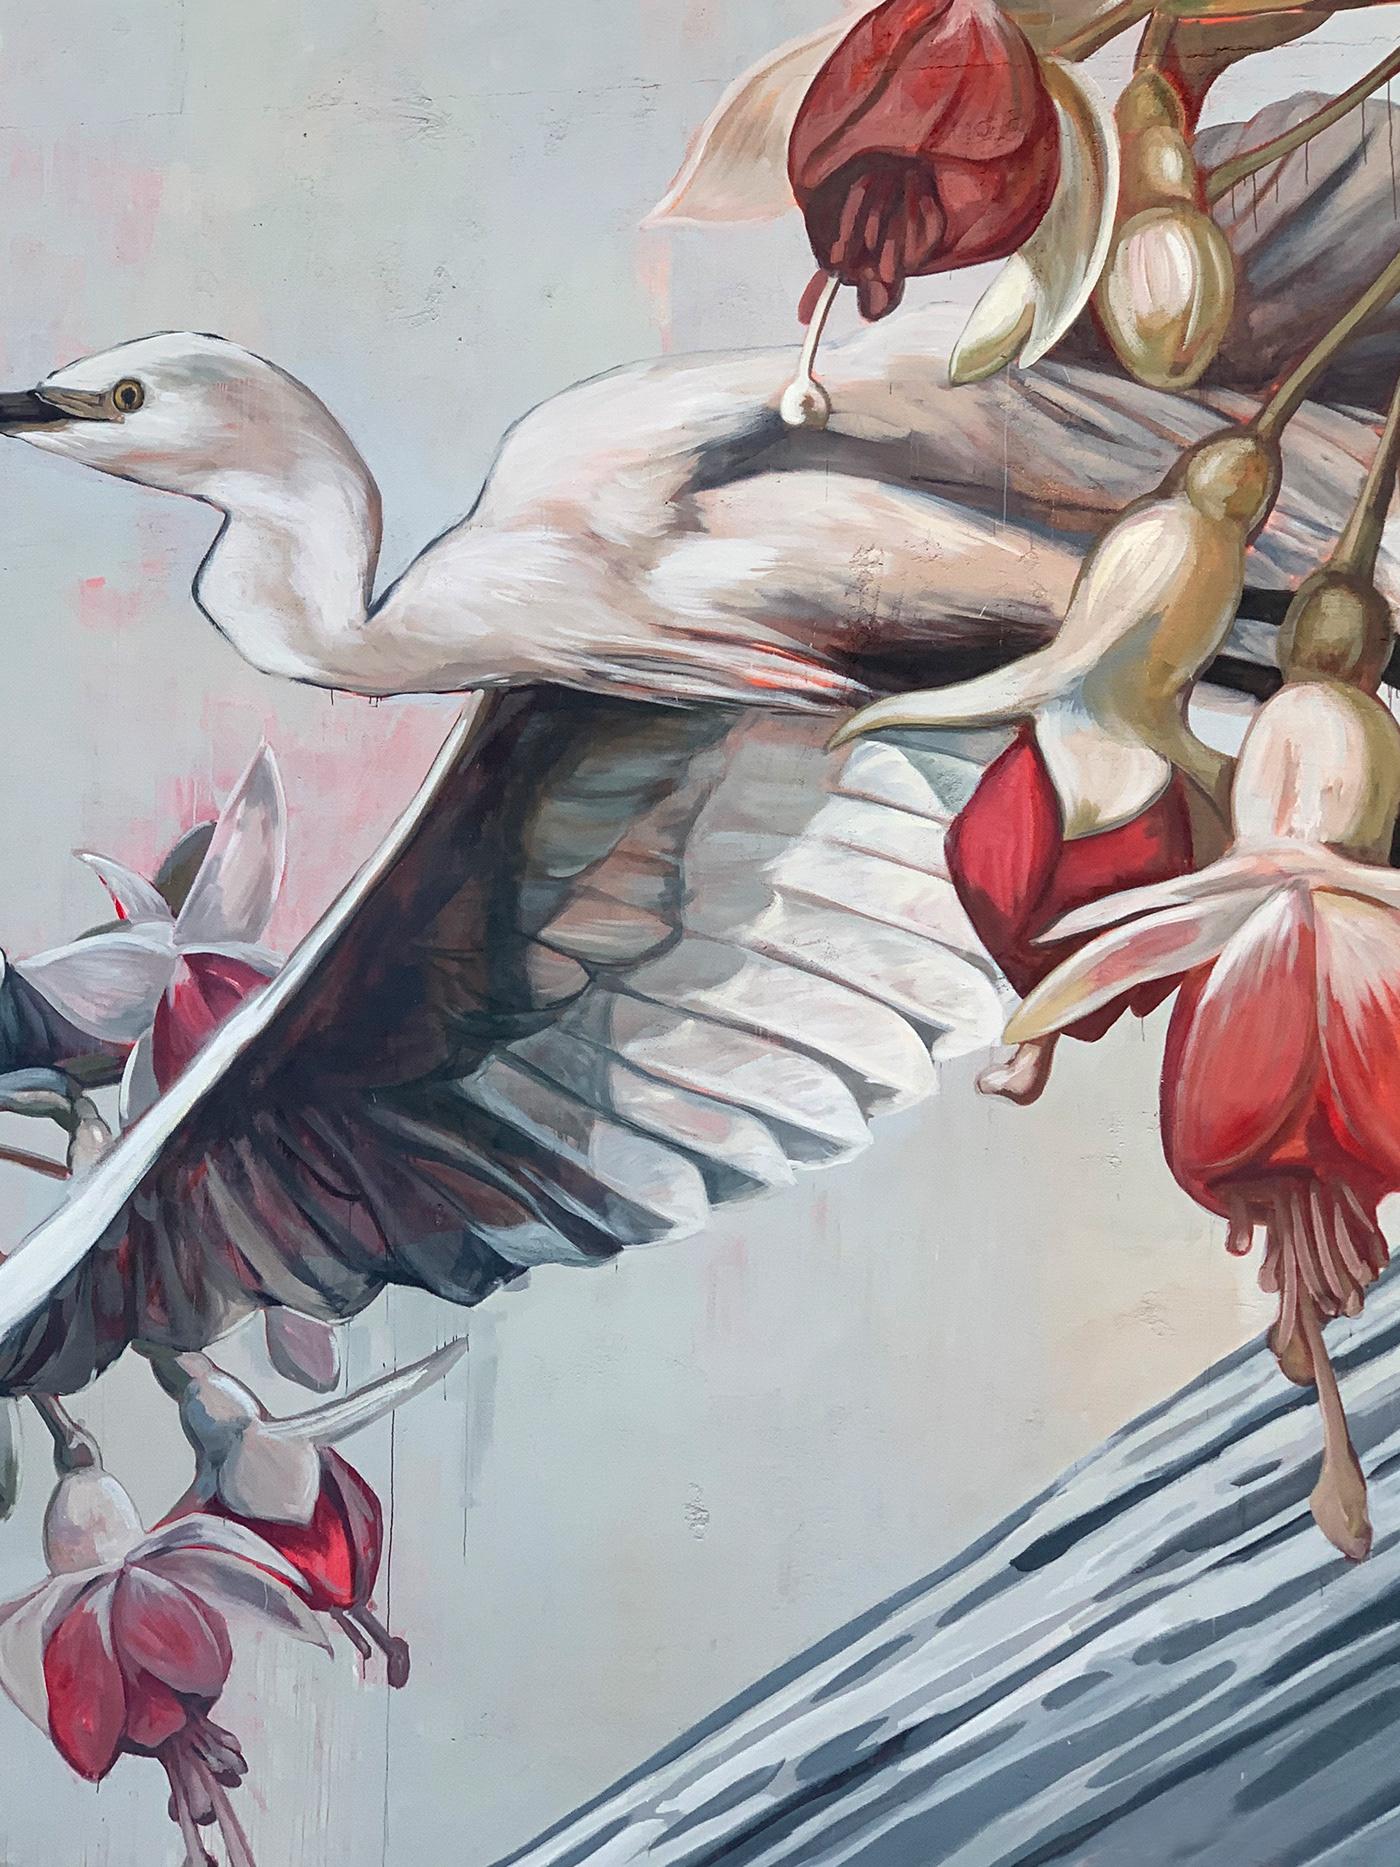 arte urbano Dax france Lula Goce Mural streetart Graffiti